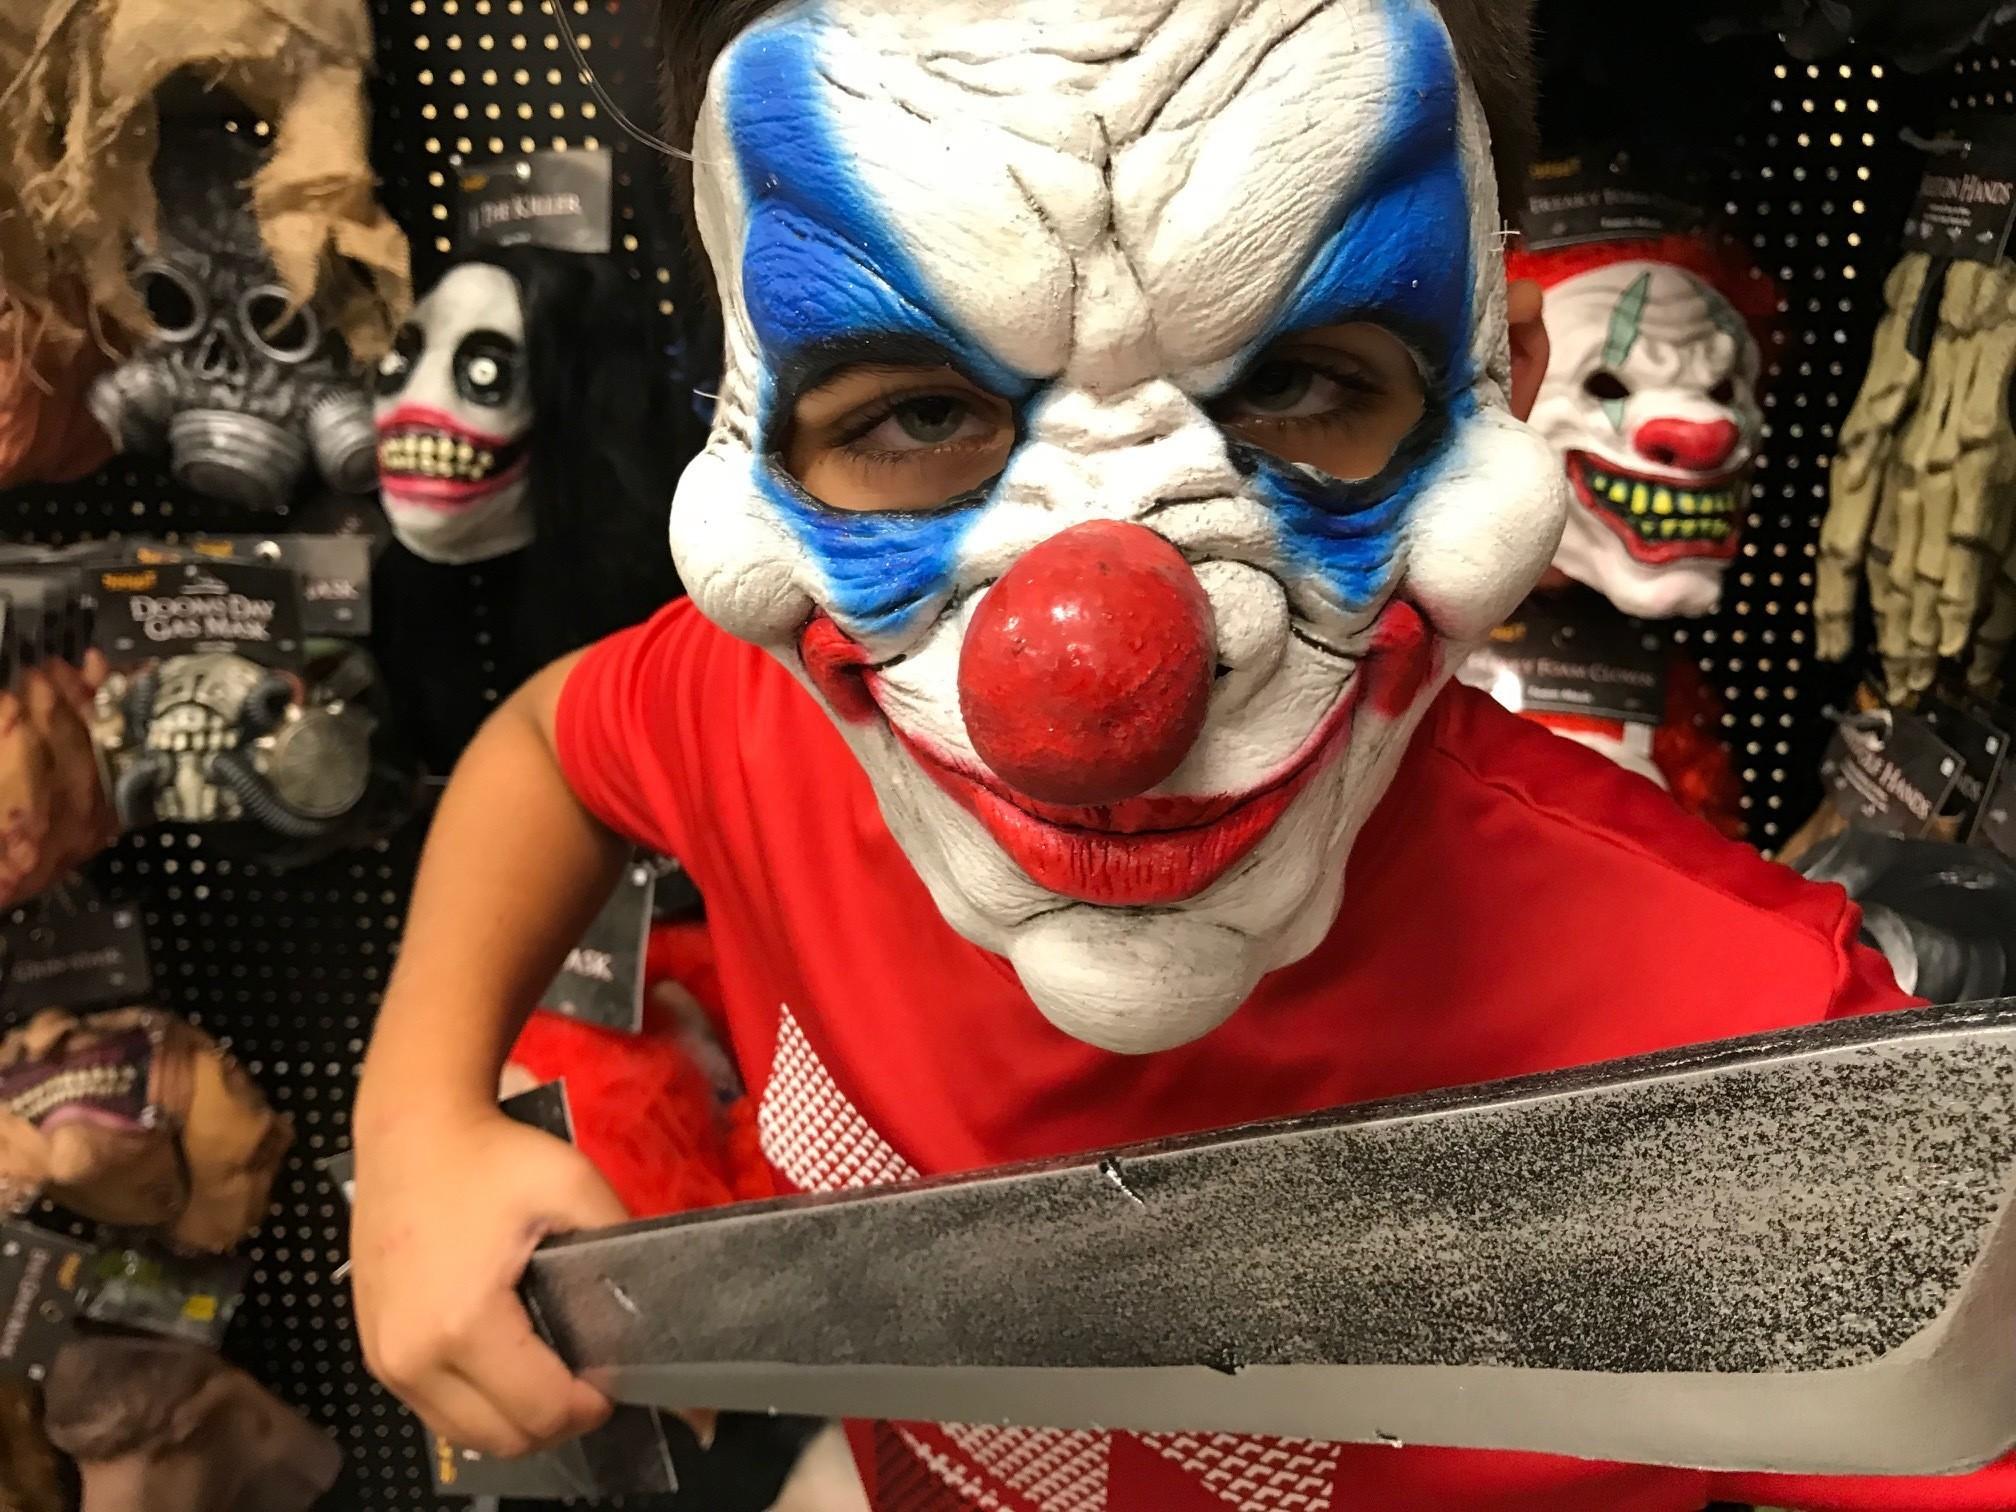 save 20 percent on costumes at spirit halloween shops - sun sentinel